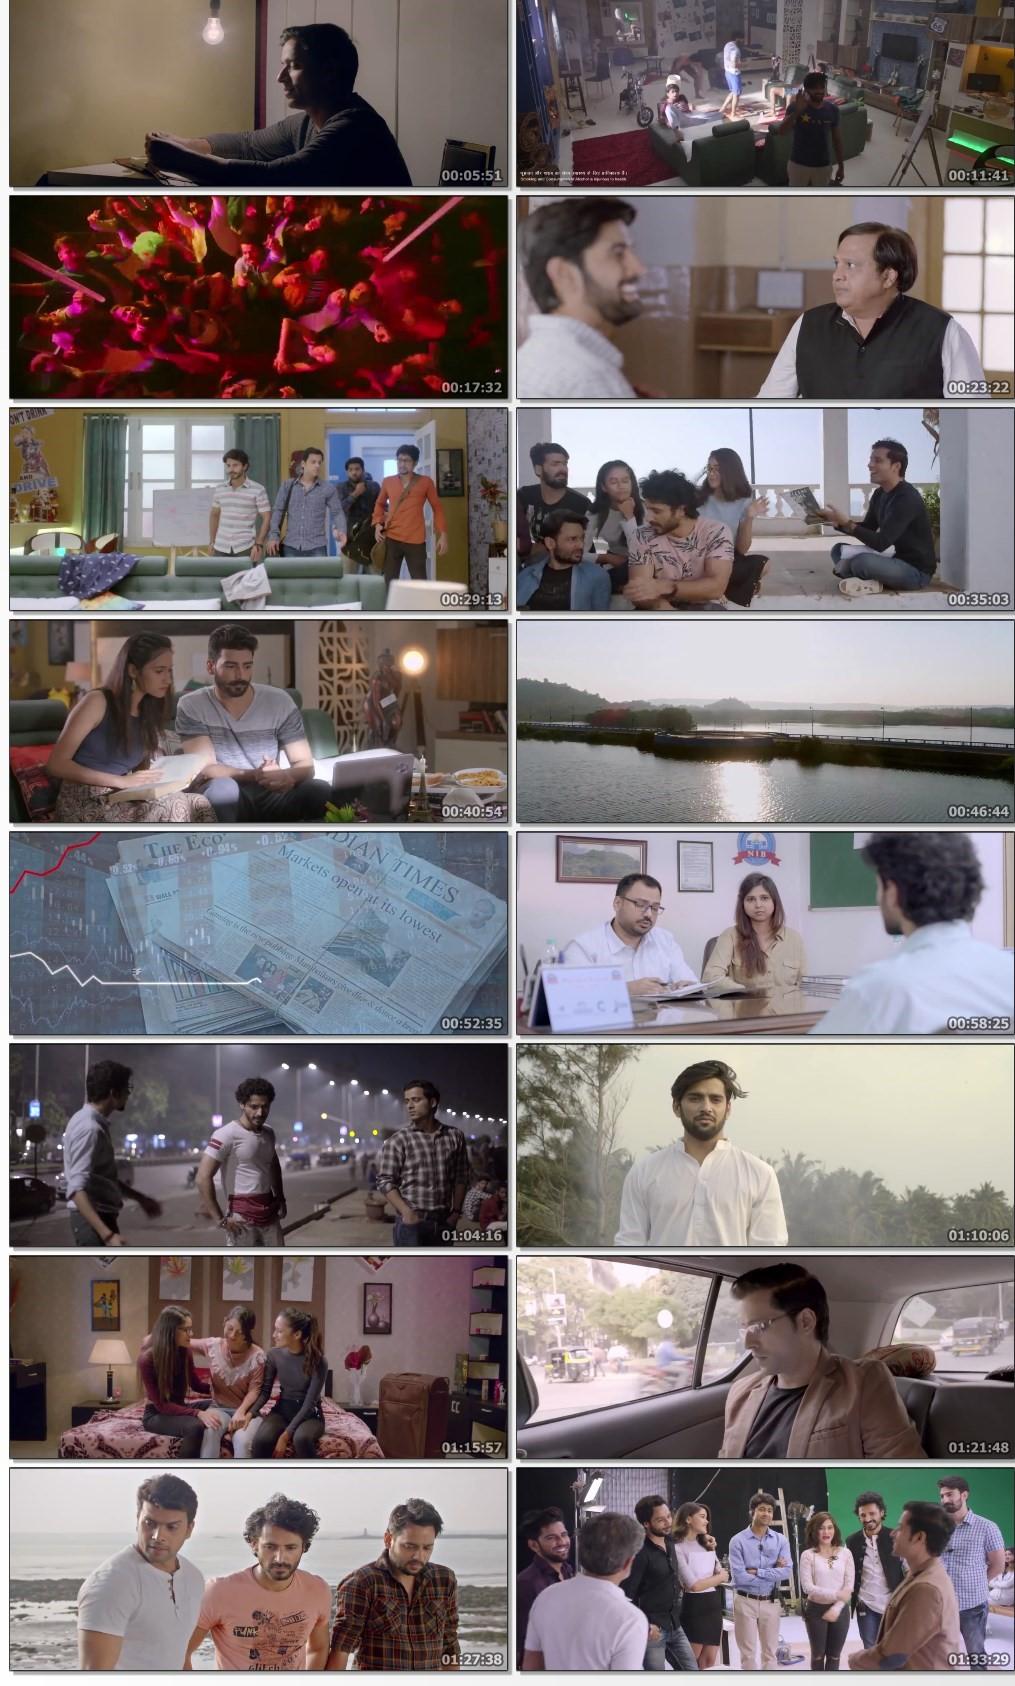 The-Successful-Loosers-2021-Hindi-720p-MX-HDRip-700-MB-mkv-thumbsf6b494b8c30bc21b